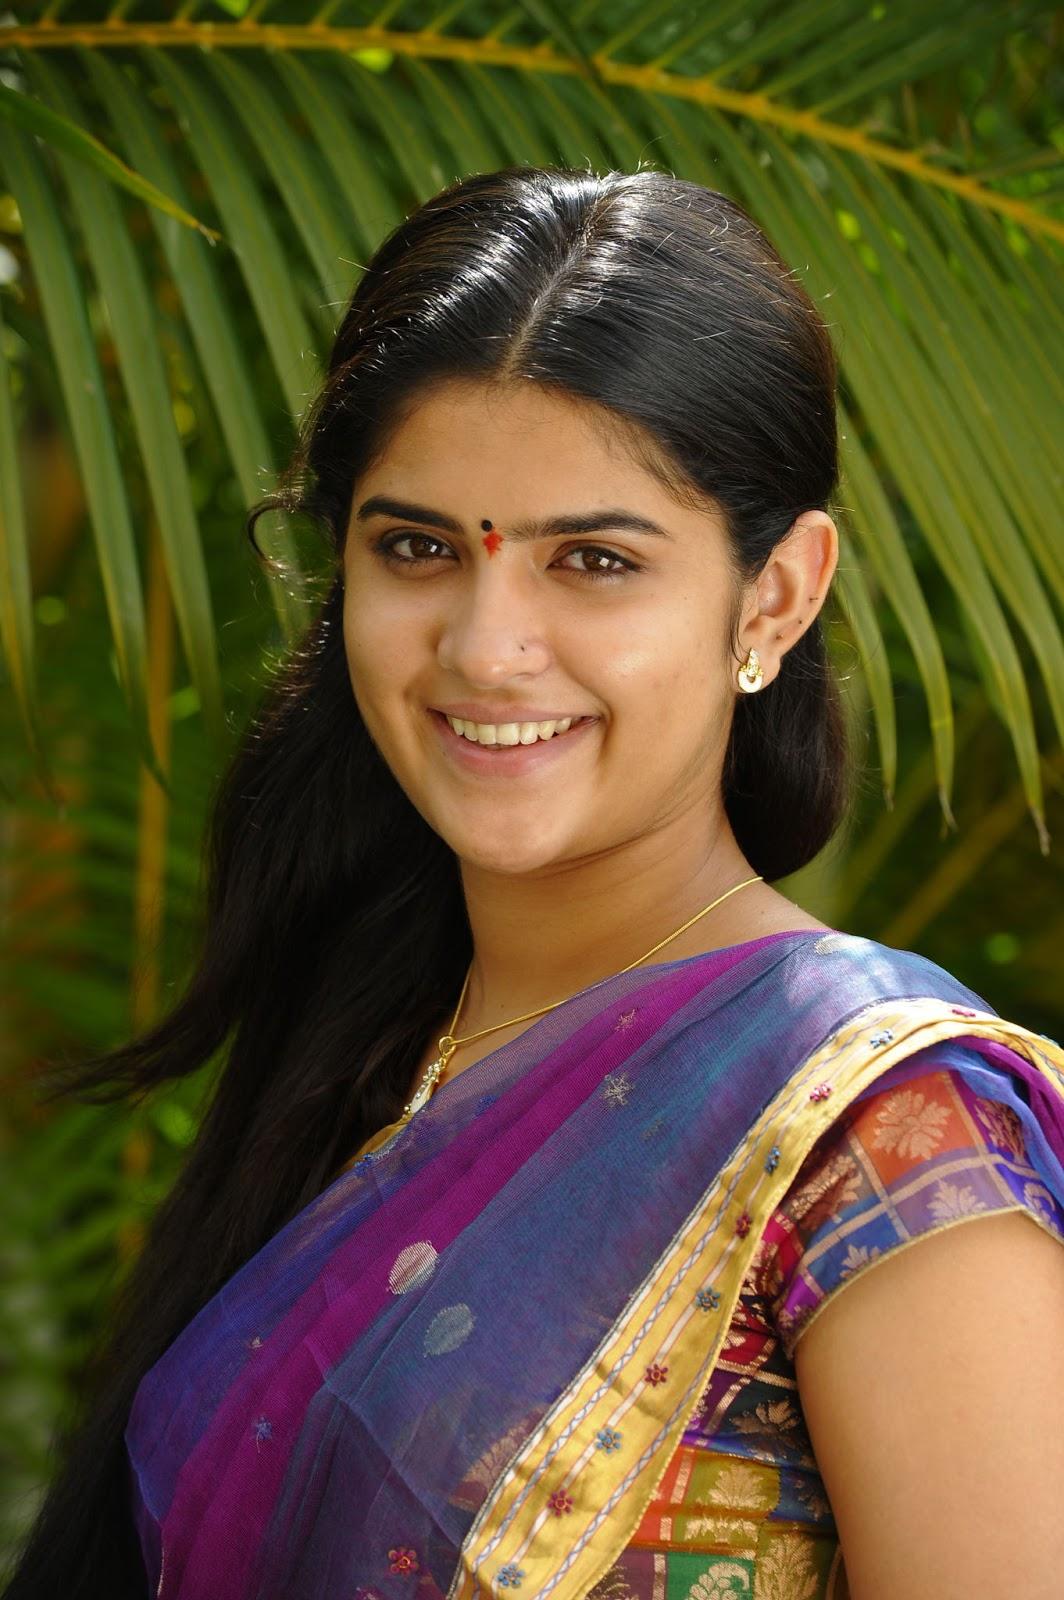 Hd Anushka Shetty Wallpaper 51 Top Hd Wallpaper Deeksha Seth Hd Photos